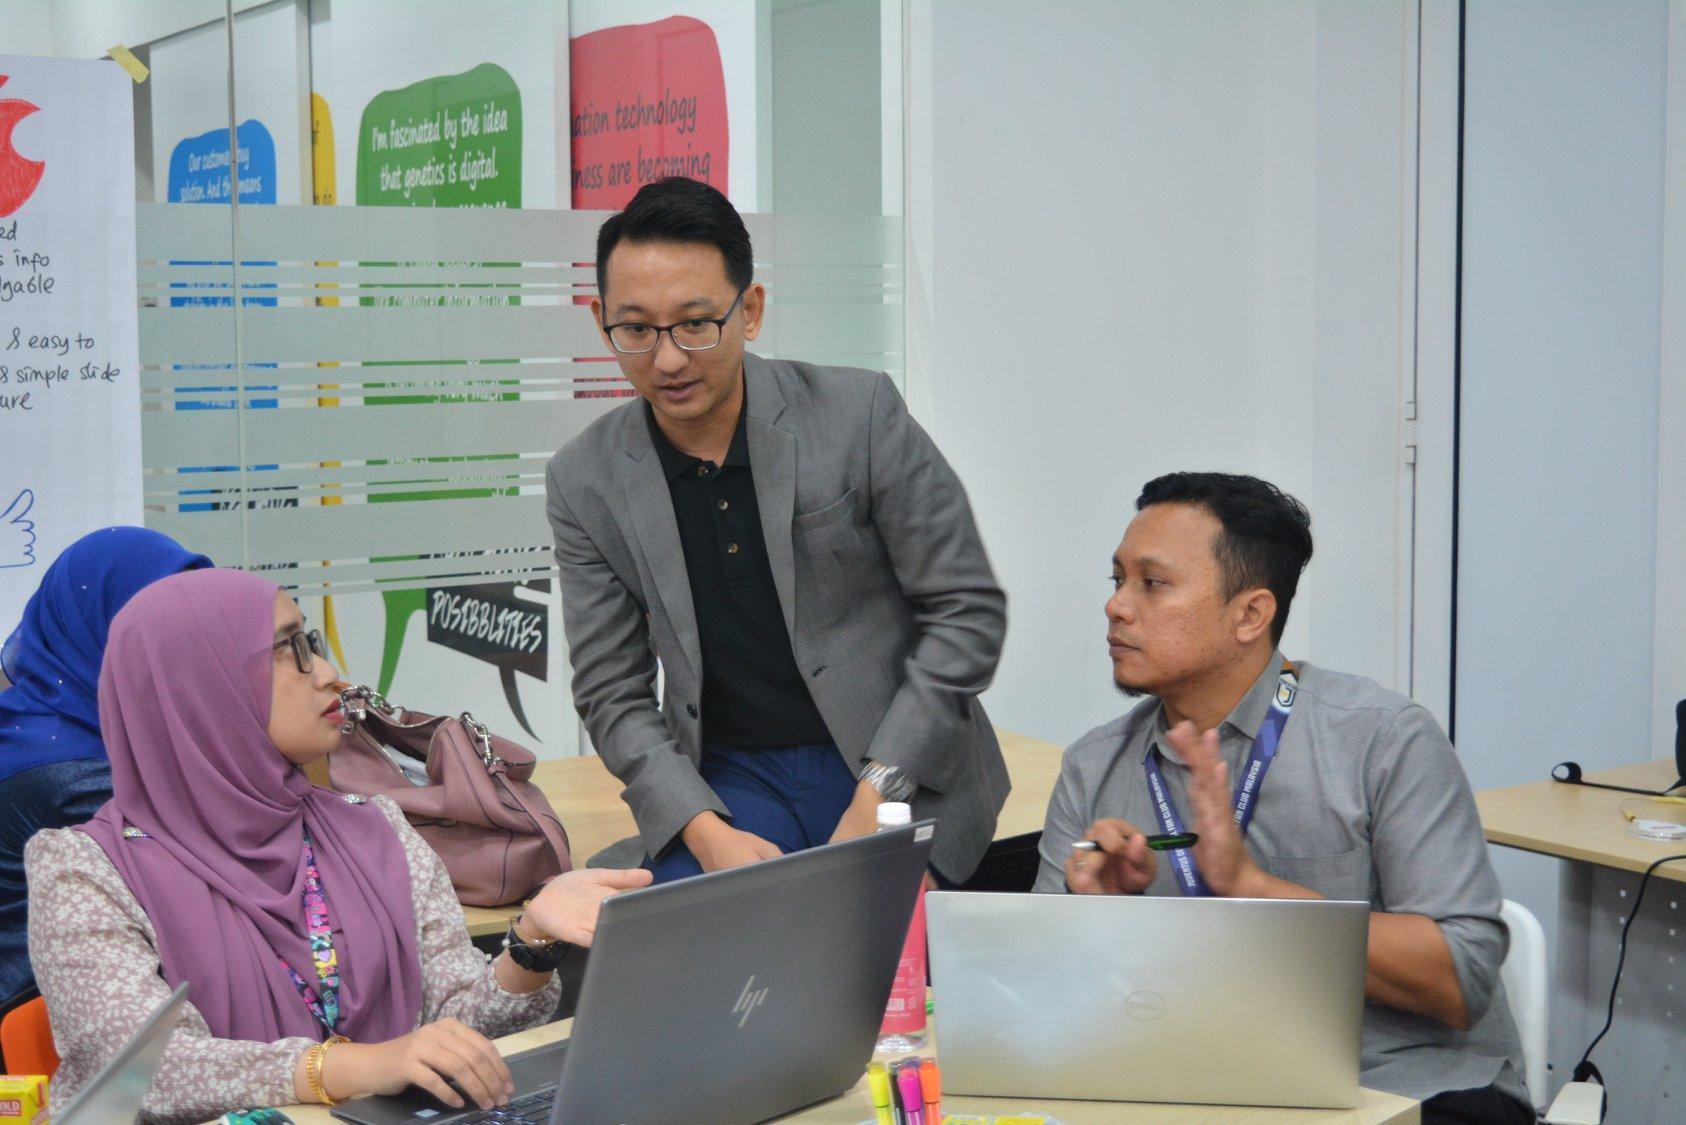 2019: Internal Training – Professionalism & Impactful Presentation